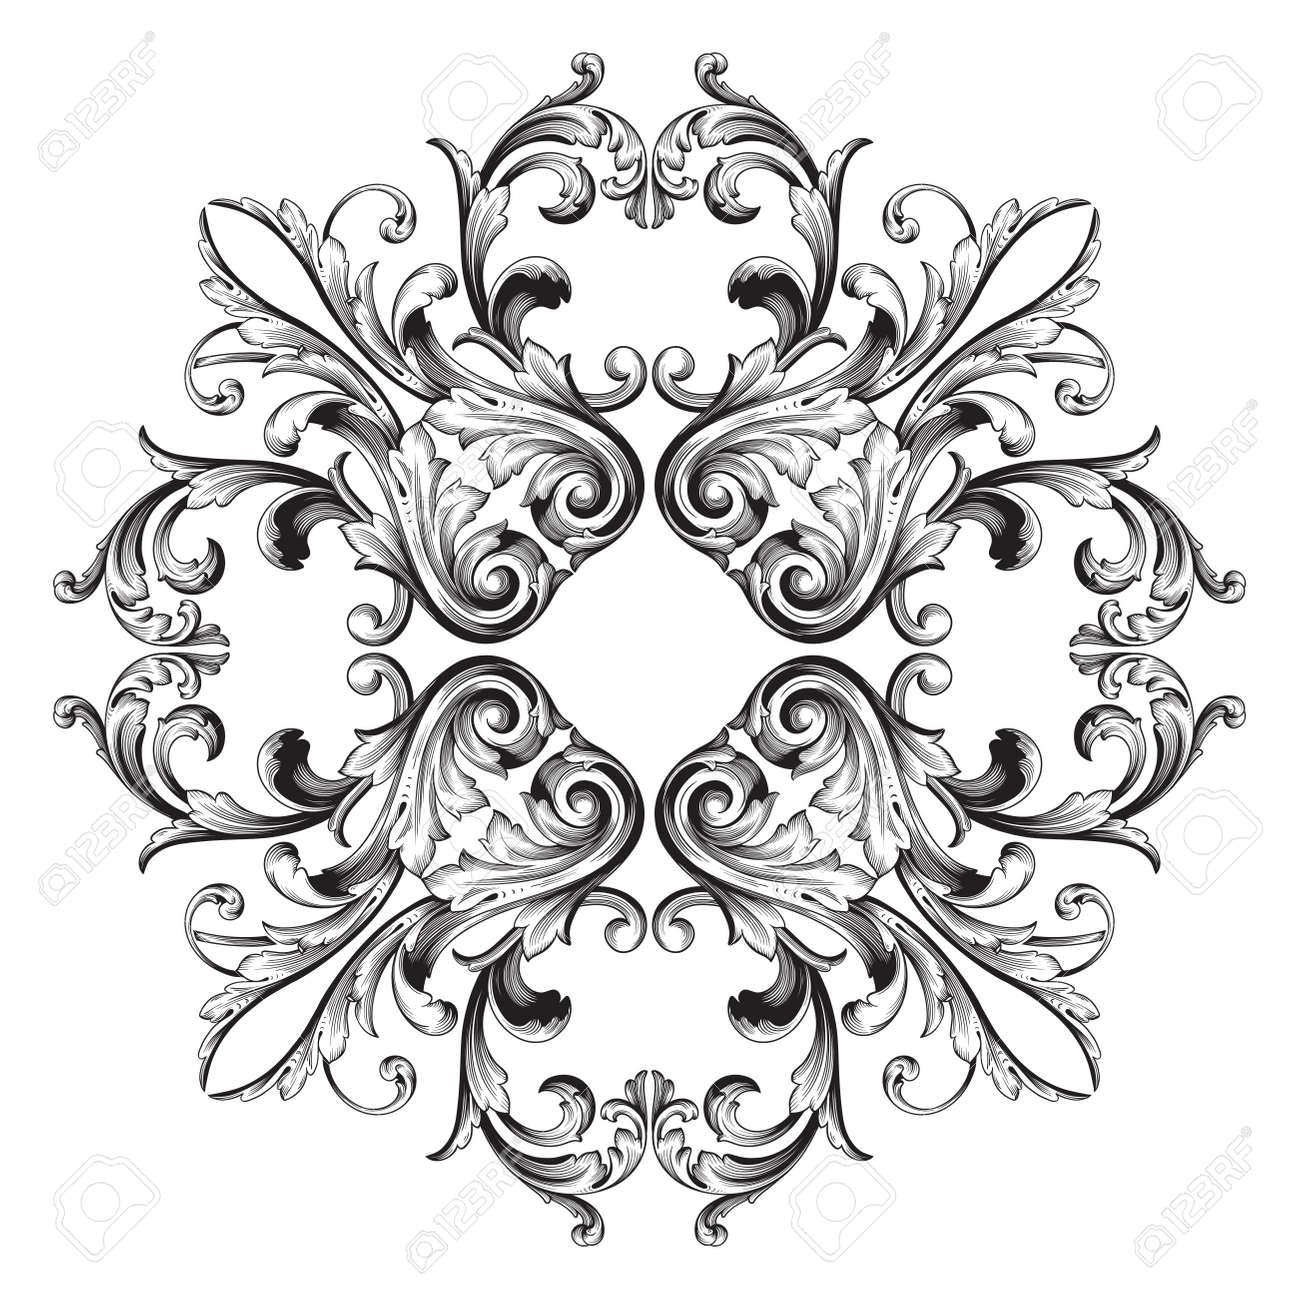 vector vintage baroque frame scroll ornament engraving border floral retro pattern antique style acanthus foliage swirl decorative design element filigree